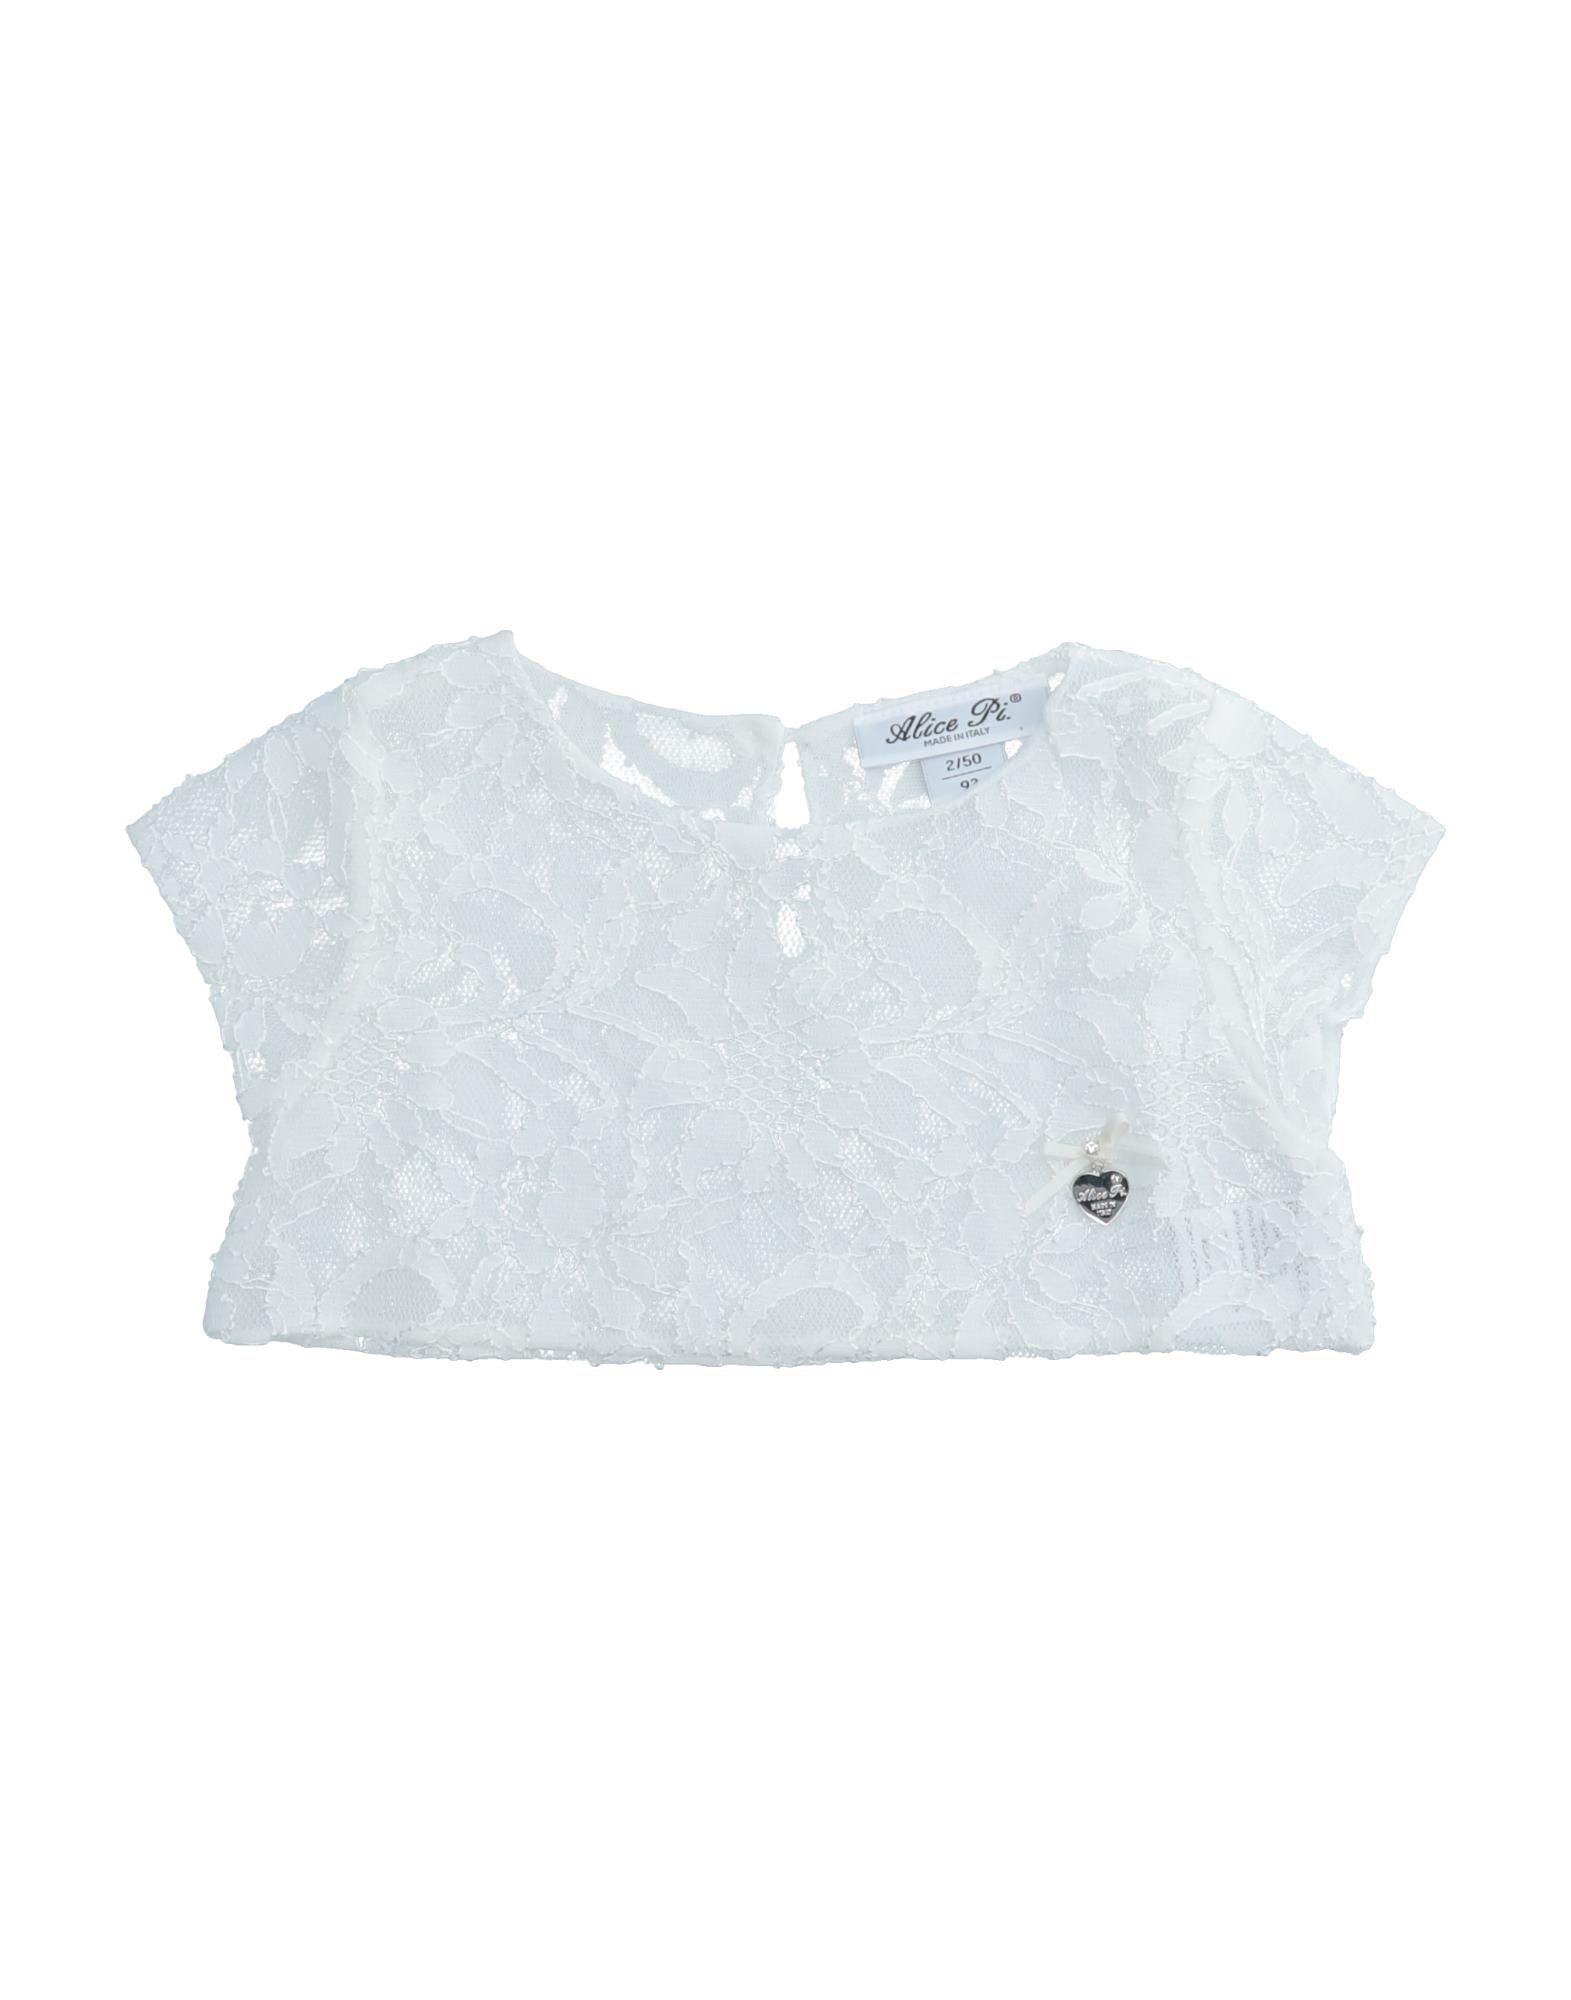 Alice Pi. Kids' T-shirts In White